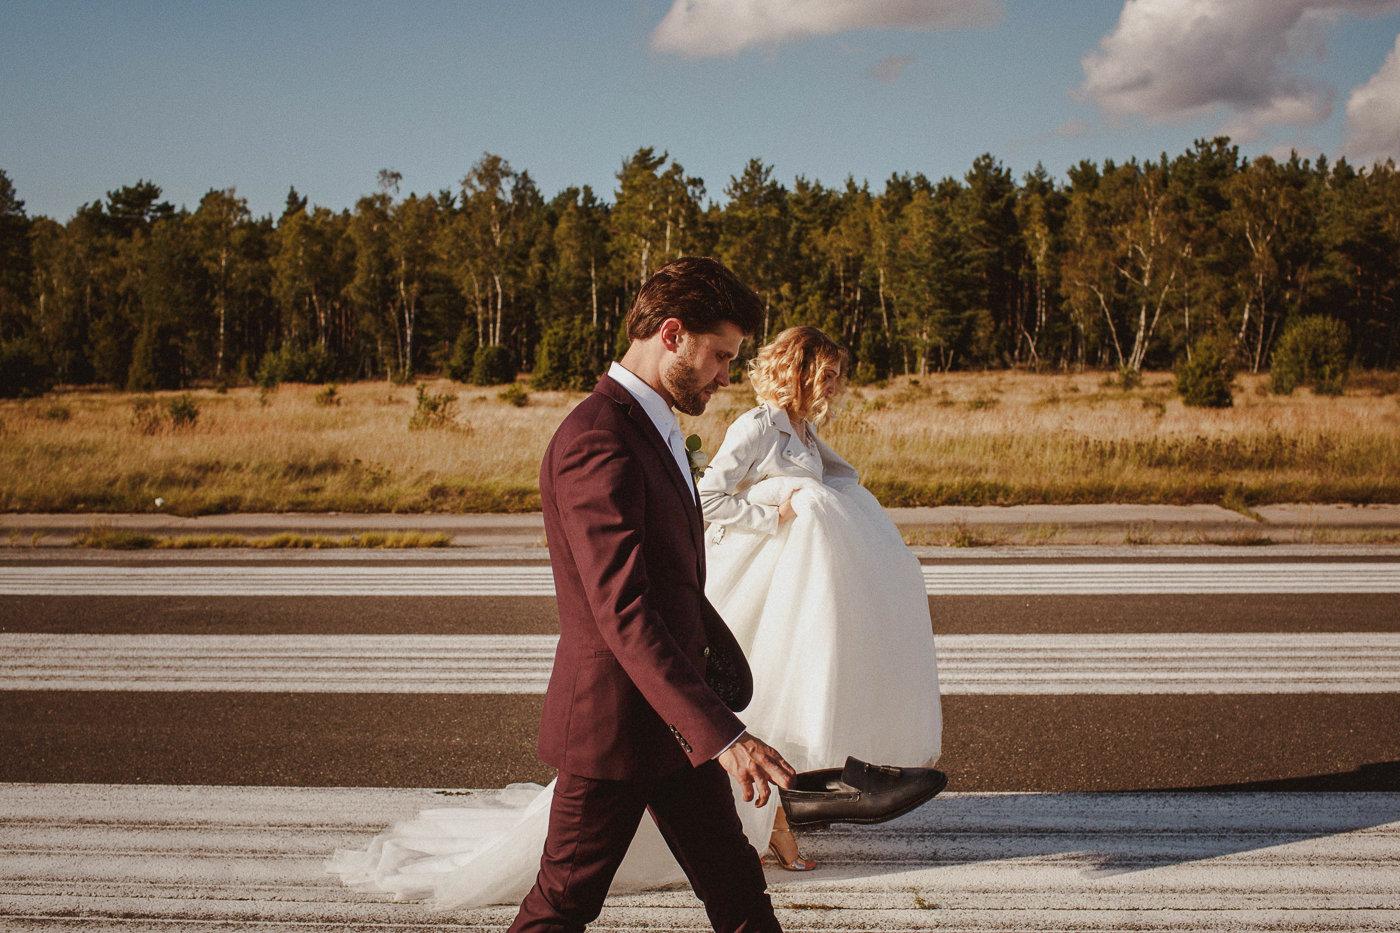 destination-wedding-photography-35.jpg